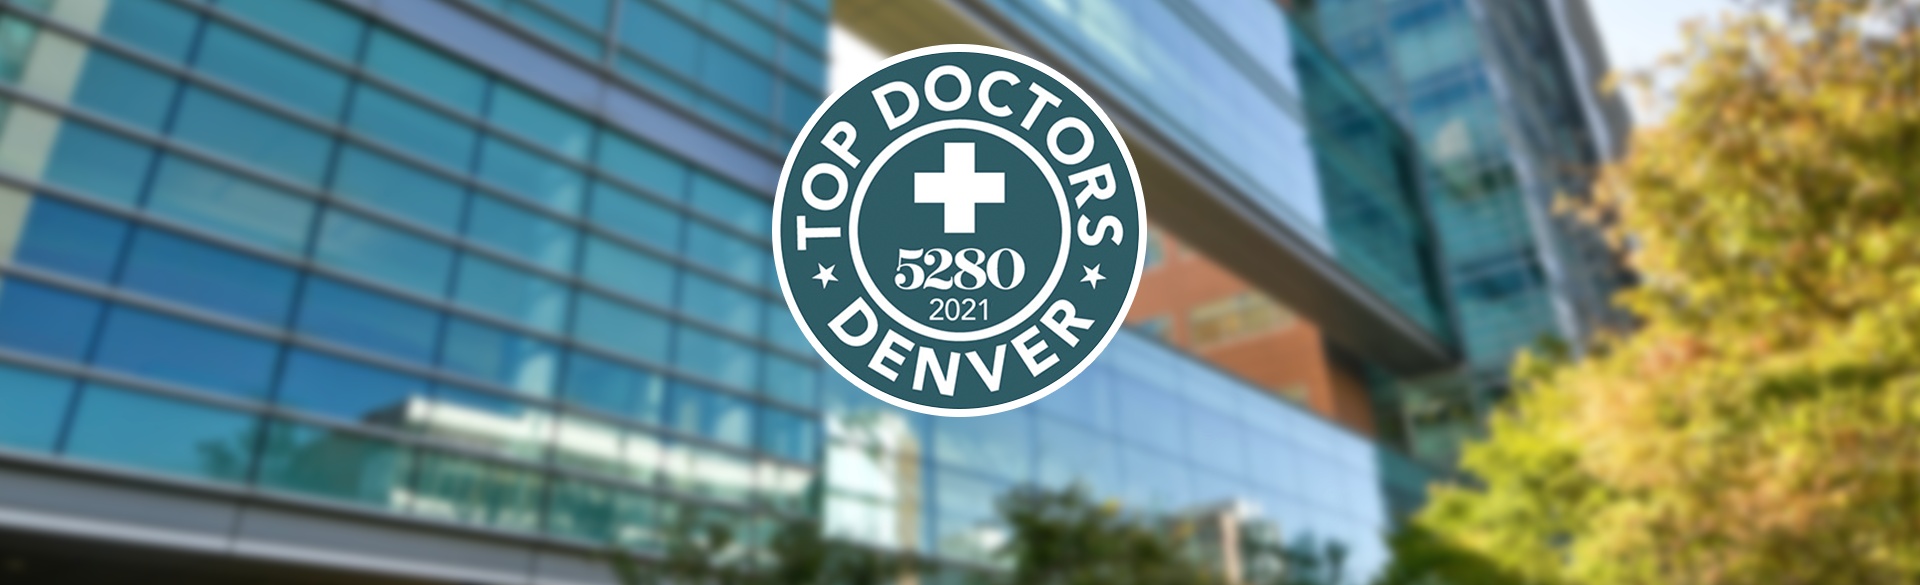 CU School of Medicine faculty members were ranked among the best on Denver-area magazine 5280 top doctors list.